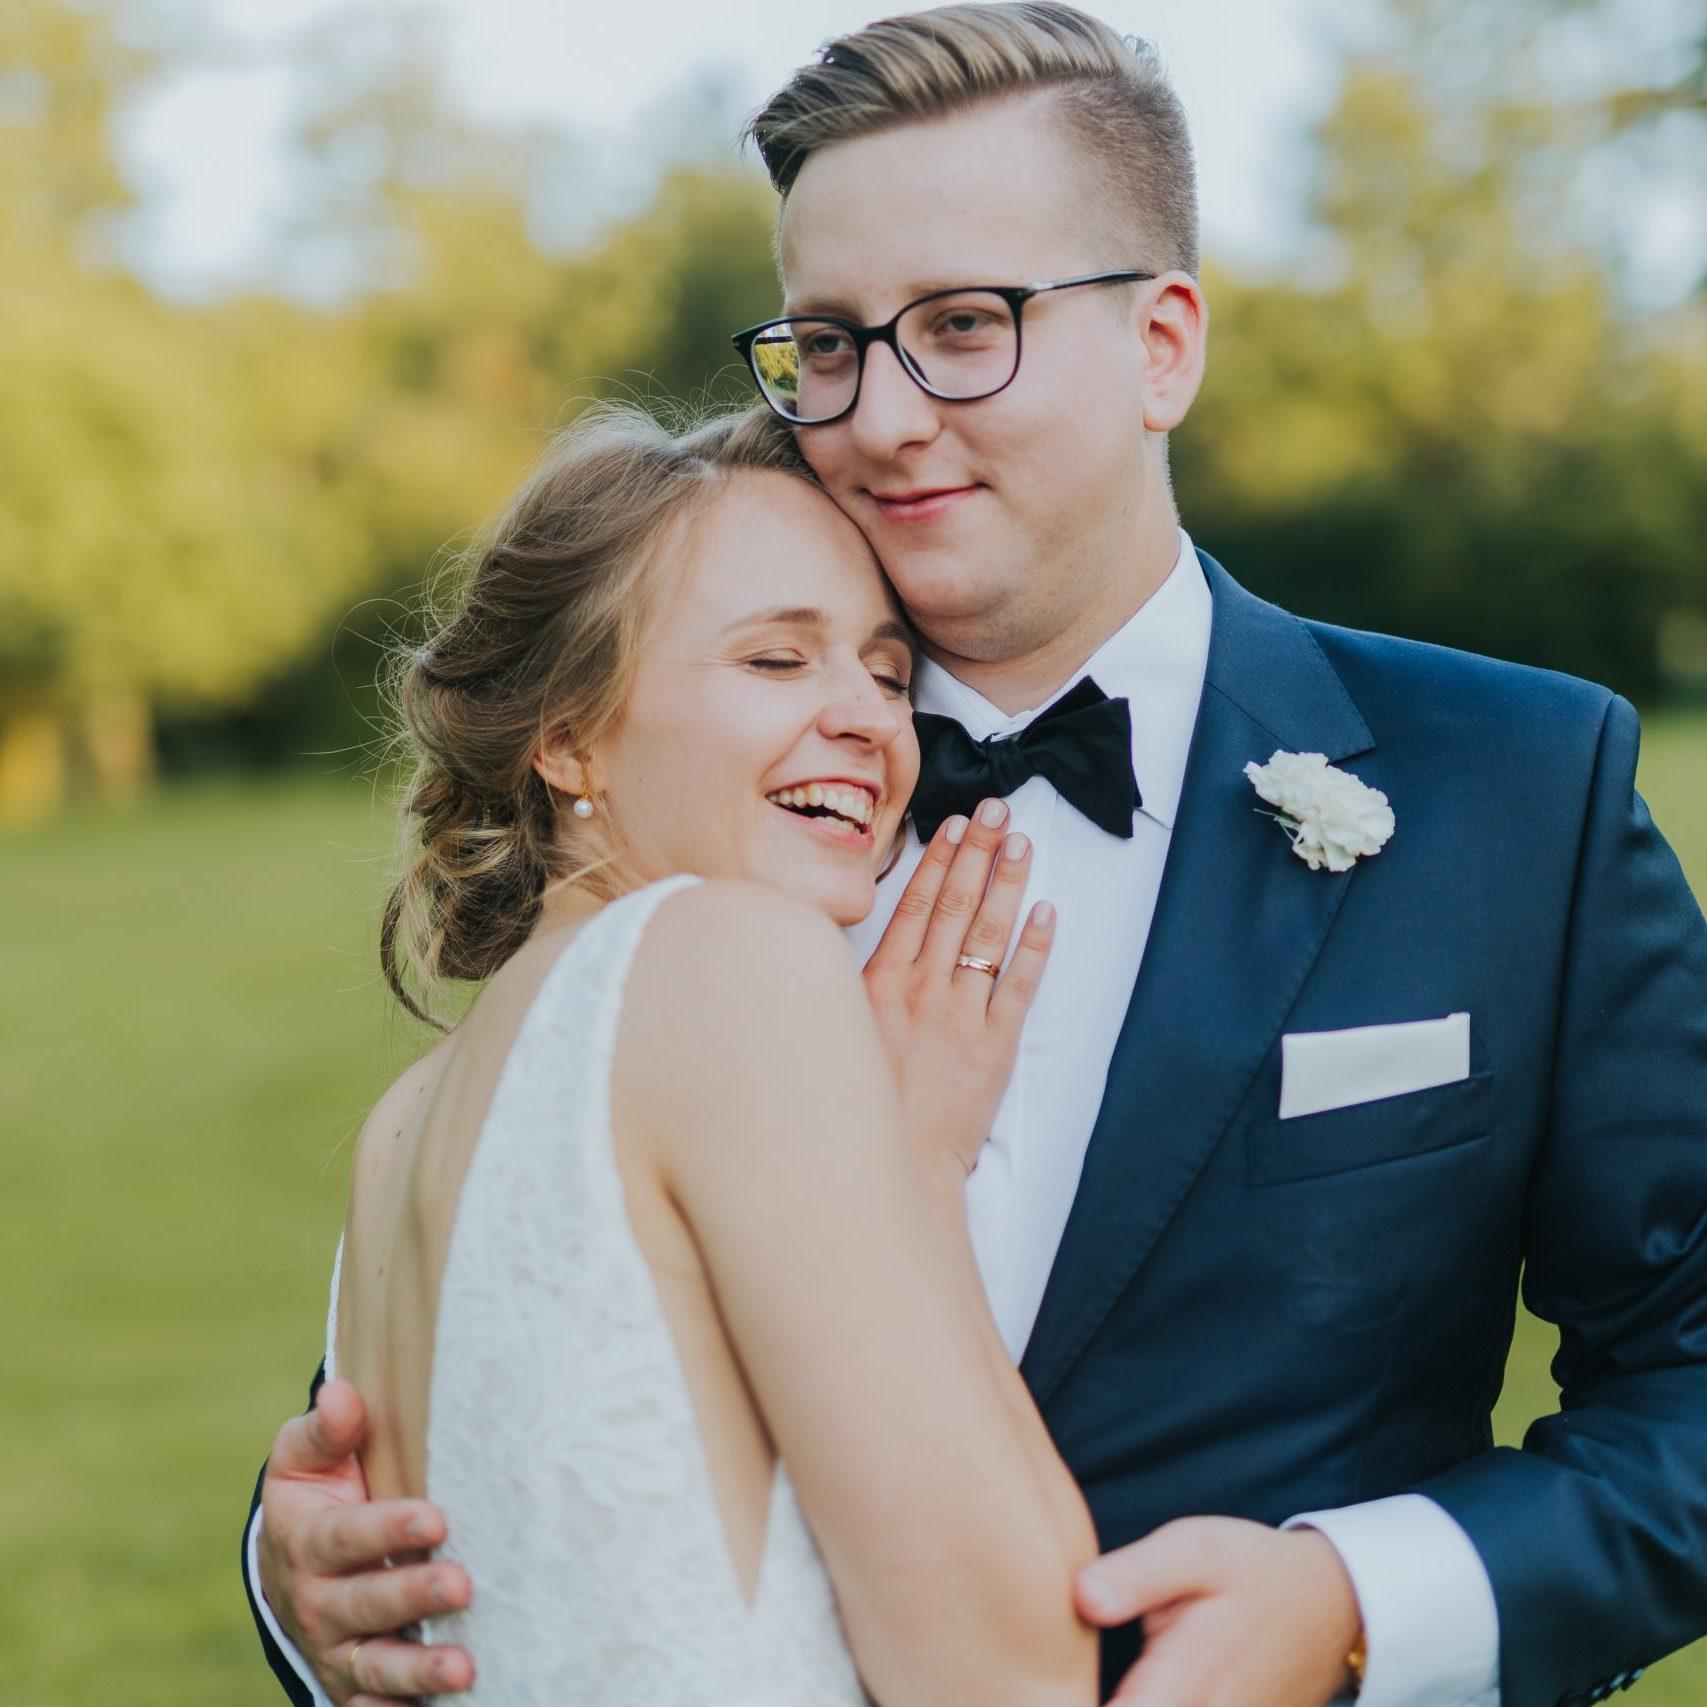 wesele-slub-lublin-wedrowny-fotograf